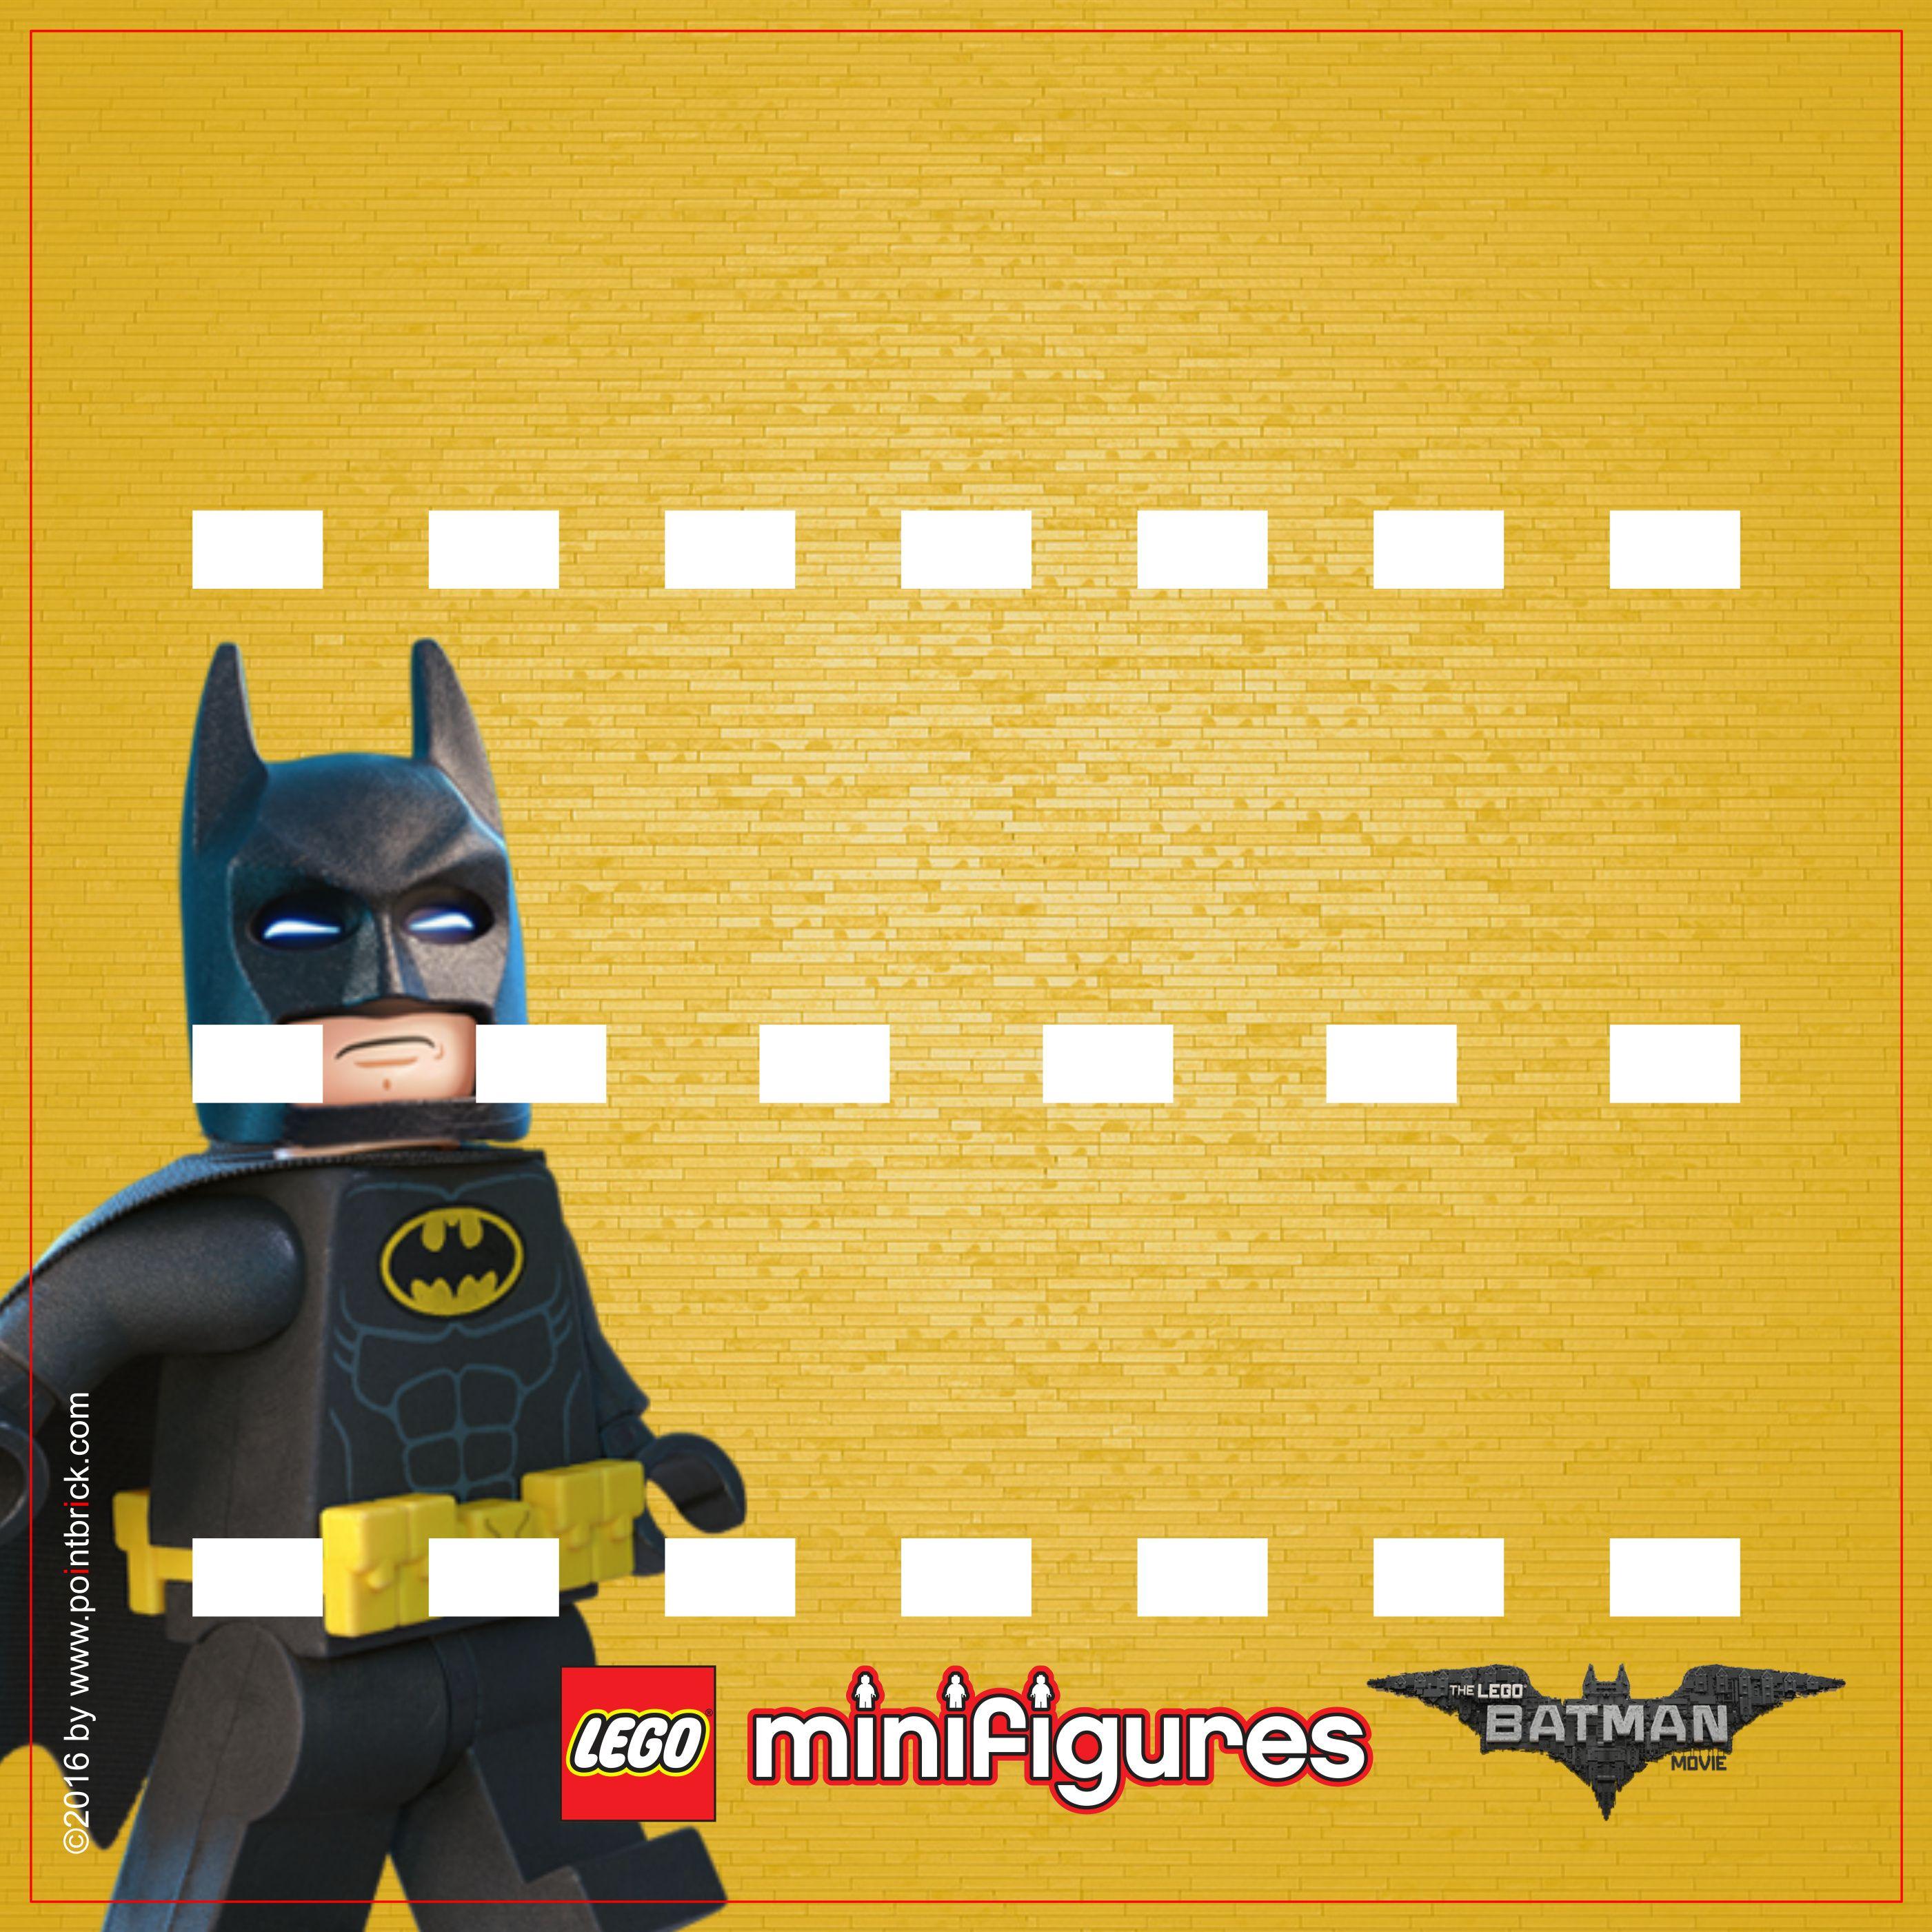 LEGO Minifigures Display: Sfondi LEGO BATMAN MOVIE | Pinterest | Plantas